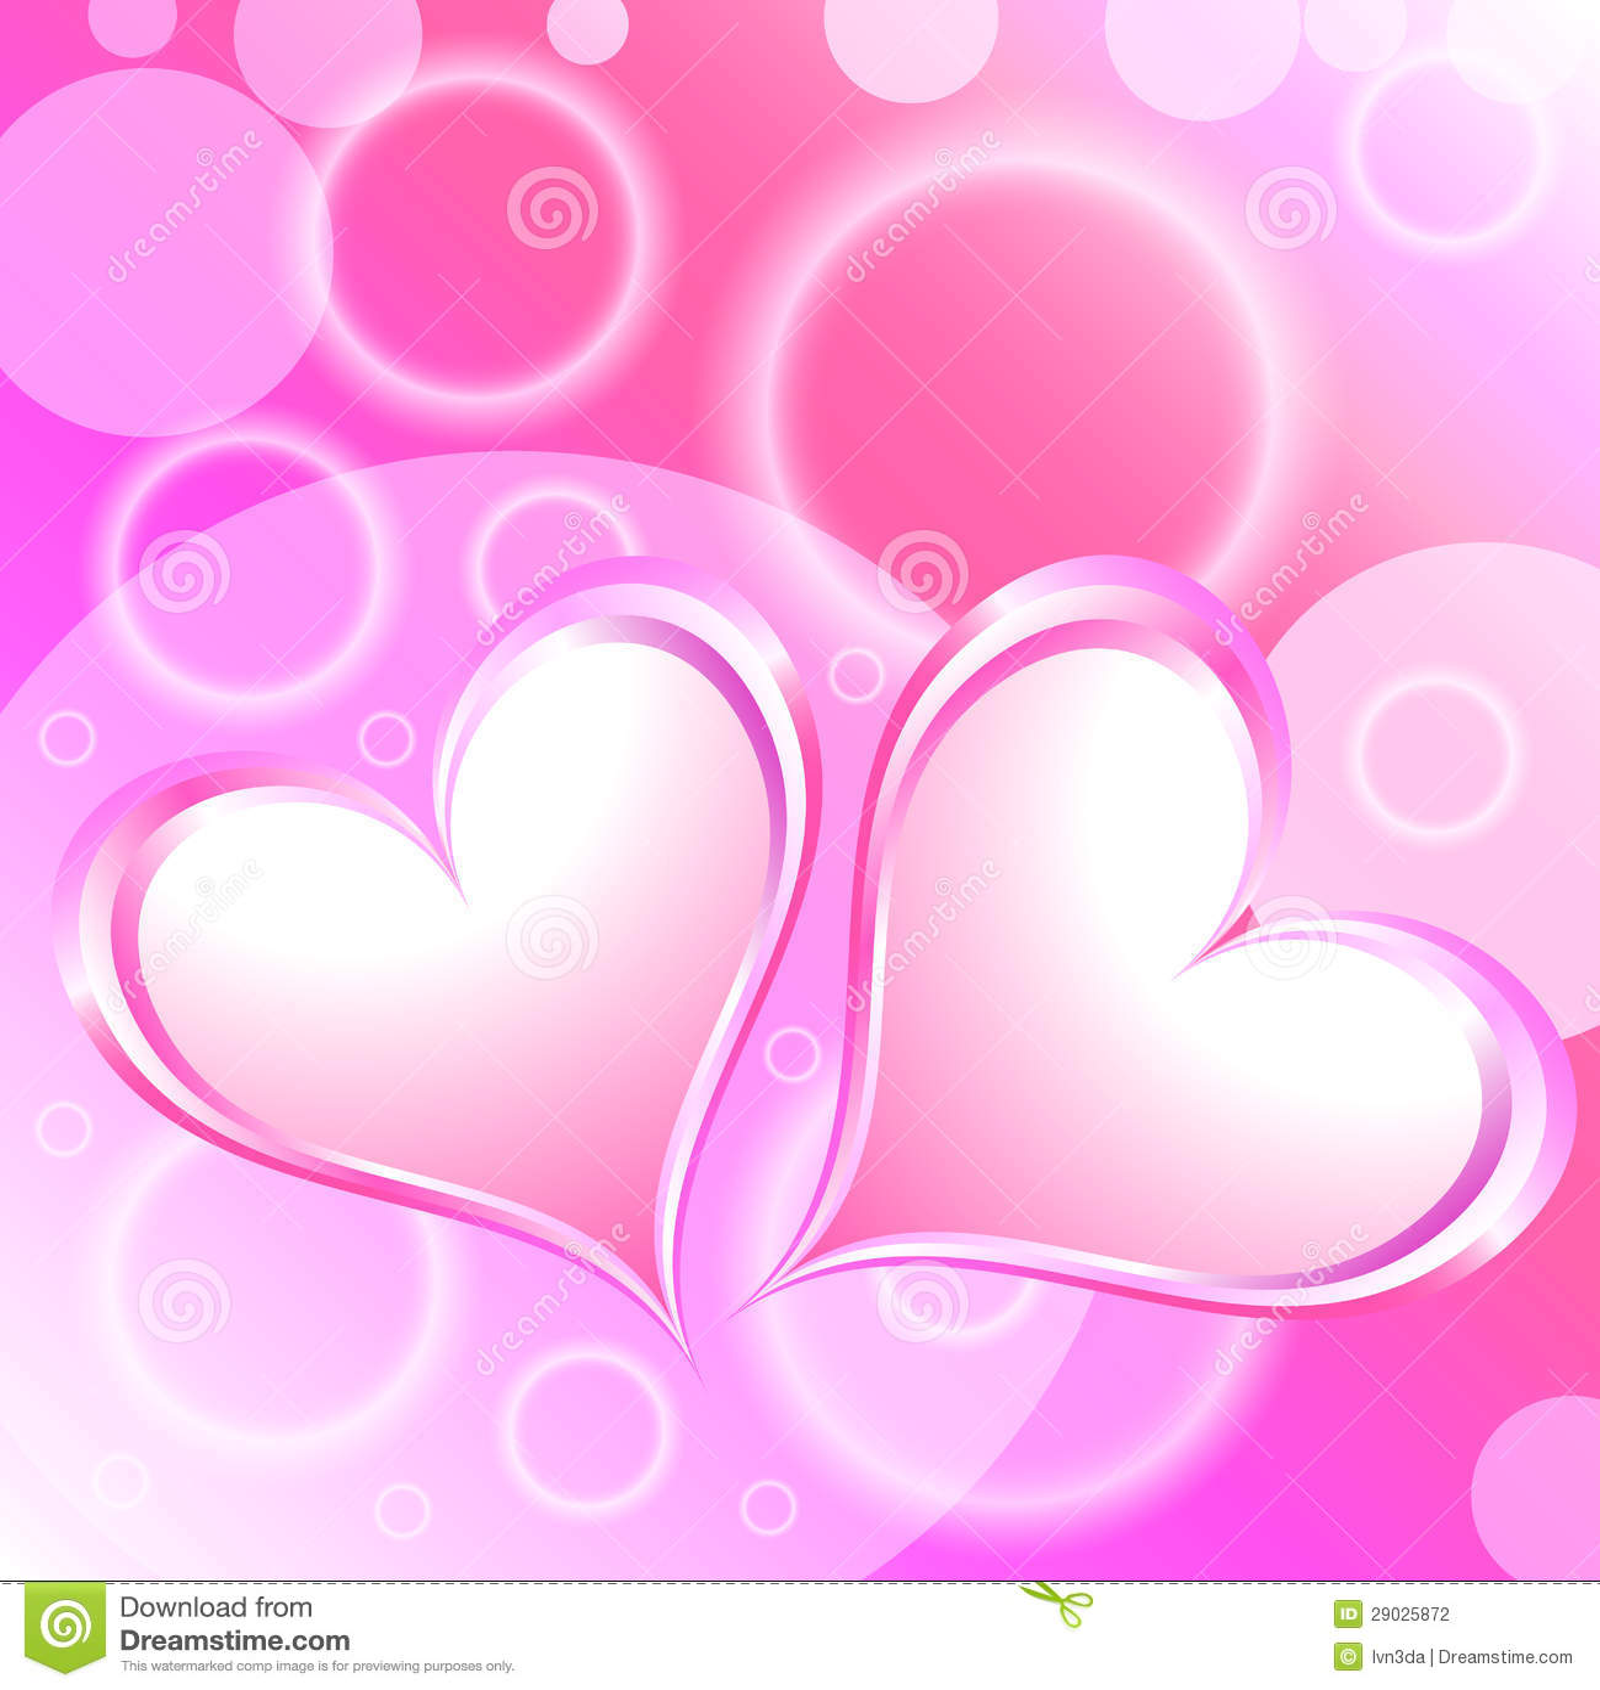 pink heart shiny holiday background stock photography